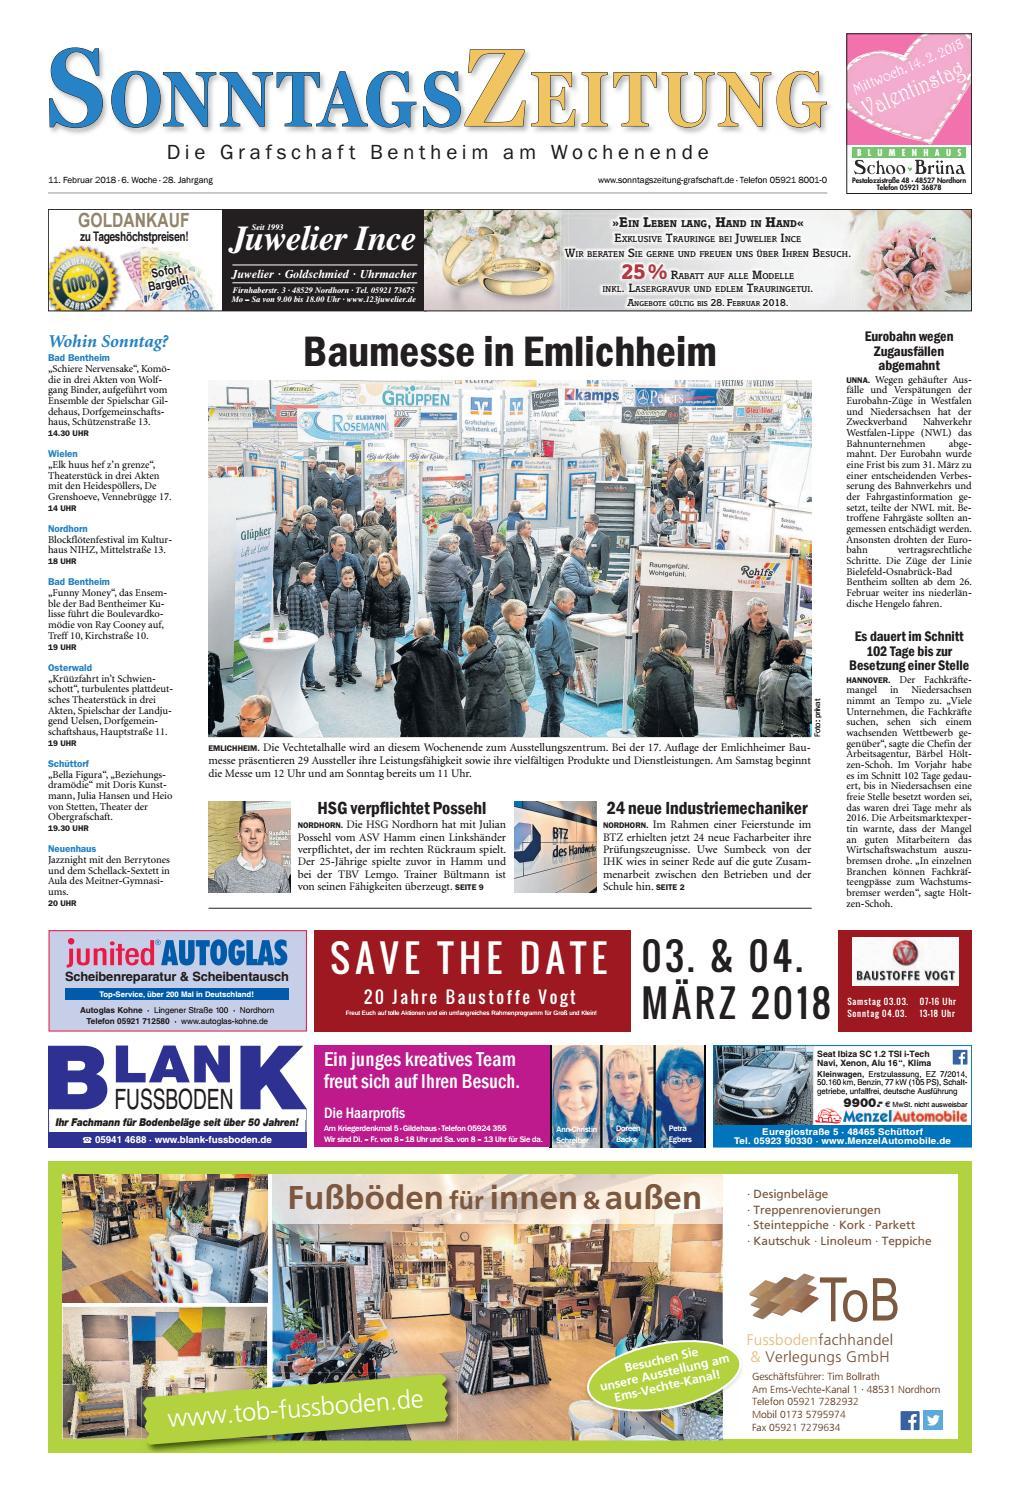 SonntagsZeitung_11-2-2018 by SonntagsZeitung - issuu